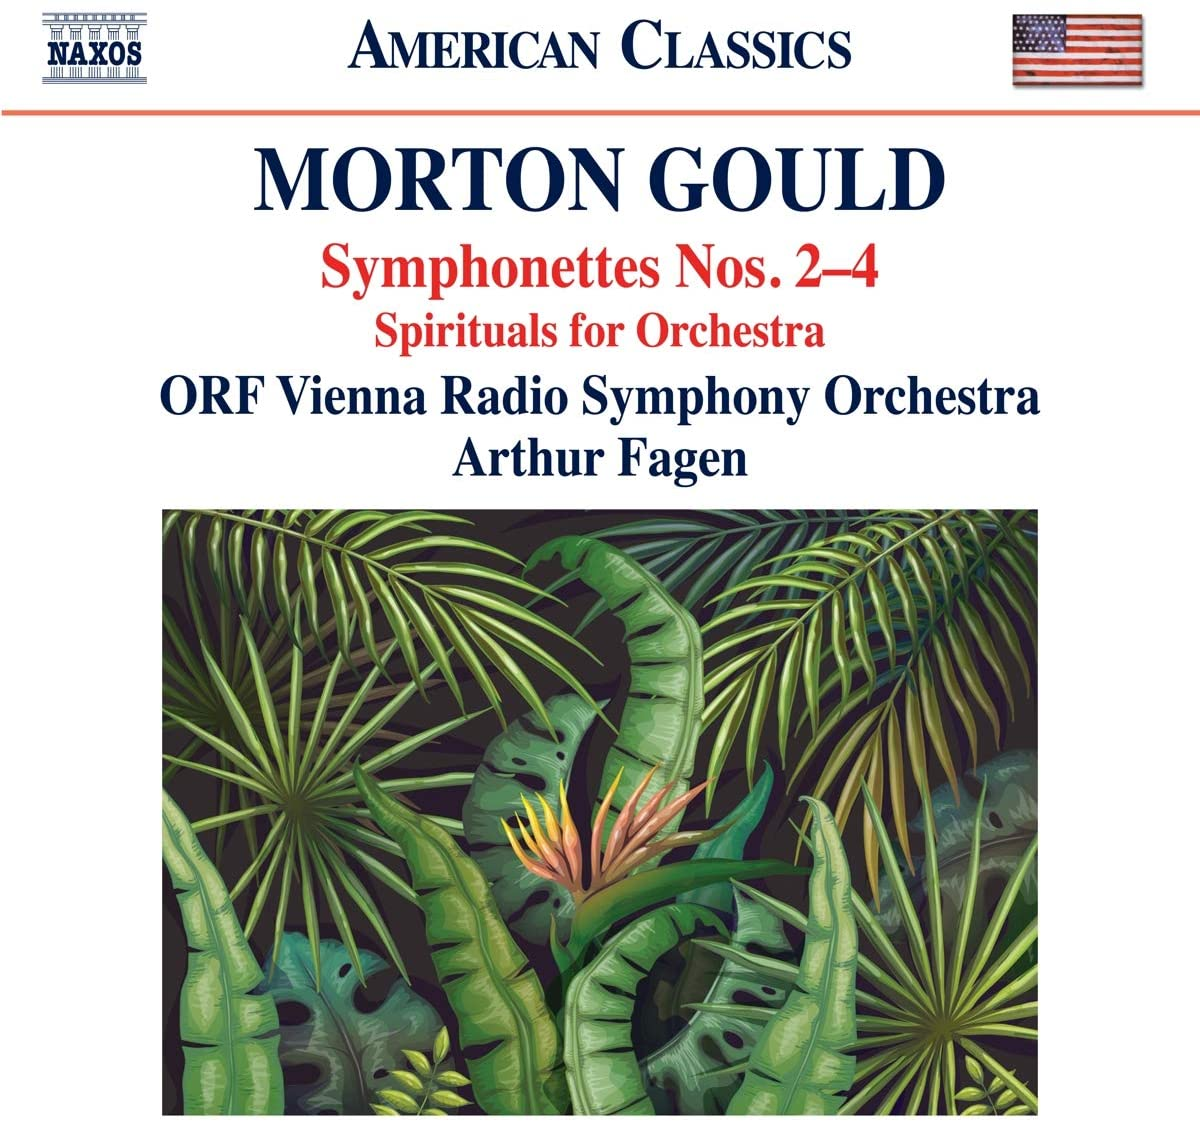 Review of GOULD Symphonettes Nos 2-4. Spirituals for Orchestra (Fagen)